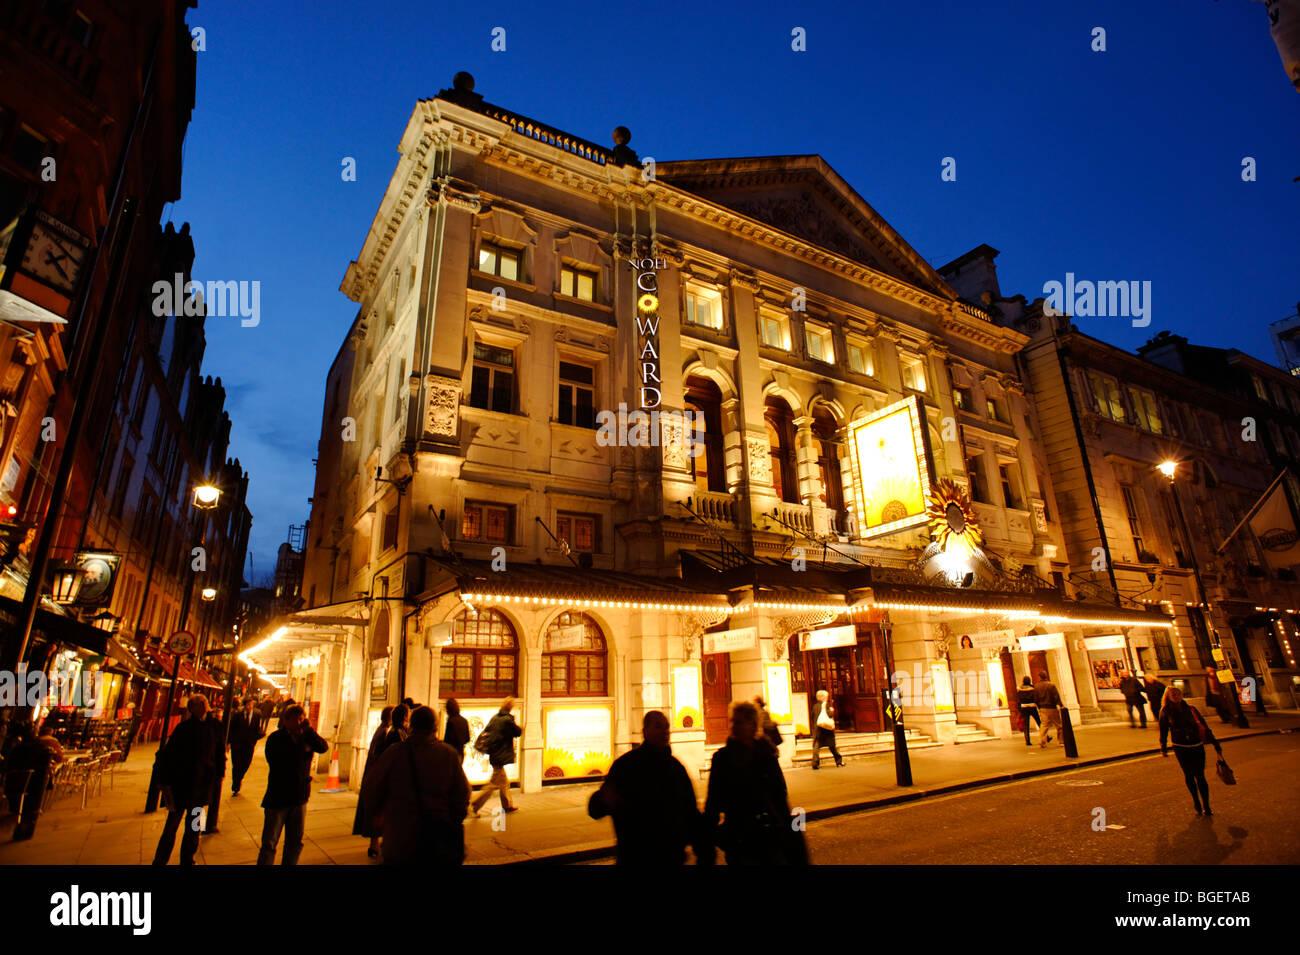 Noel Coward Theatre. Londres. UK 2009. Photo Stock